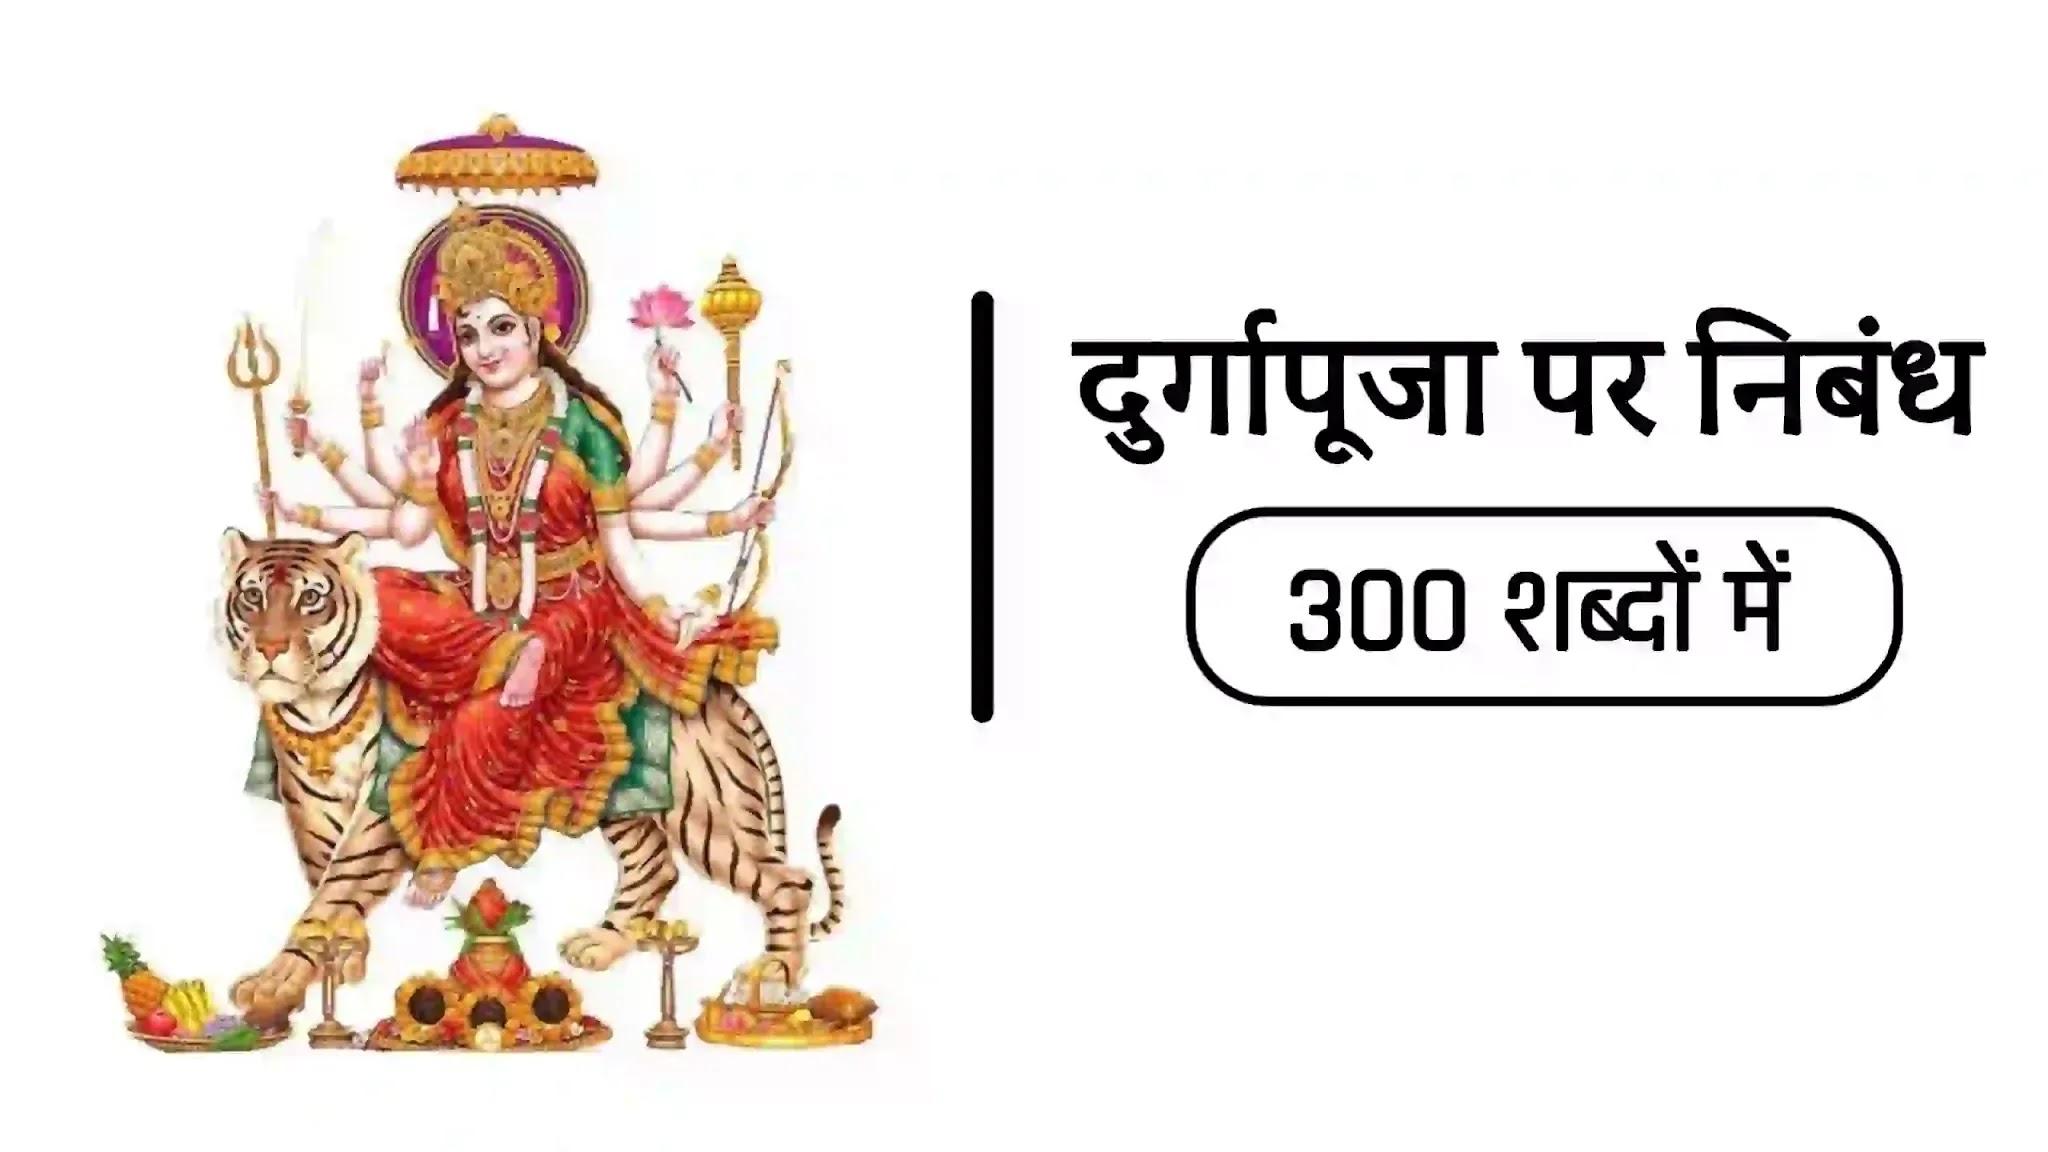 Durga puja par nibandh, essay on durga puja in hindi, durga essay in hindi, दुर्गापूजा पर निबंध, दुर्गापूजा पर निबंध लिखे, hindi essay on durga puja